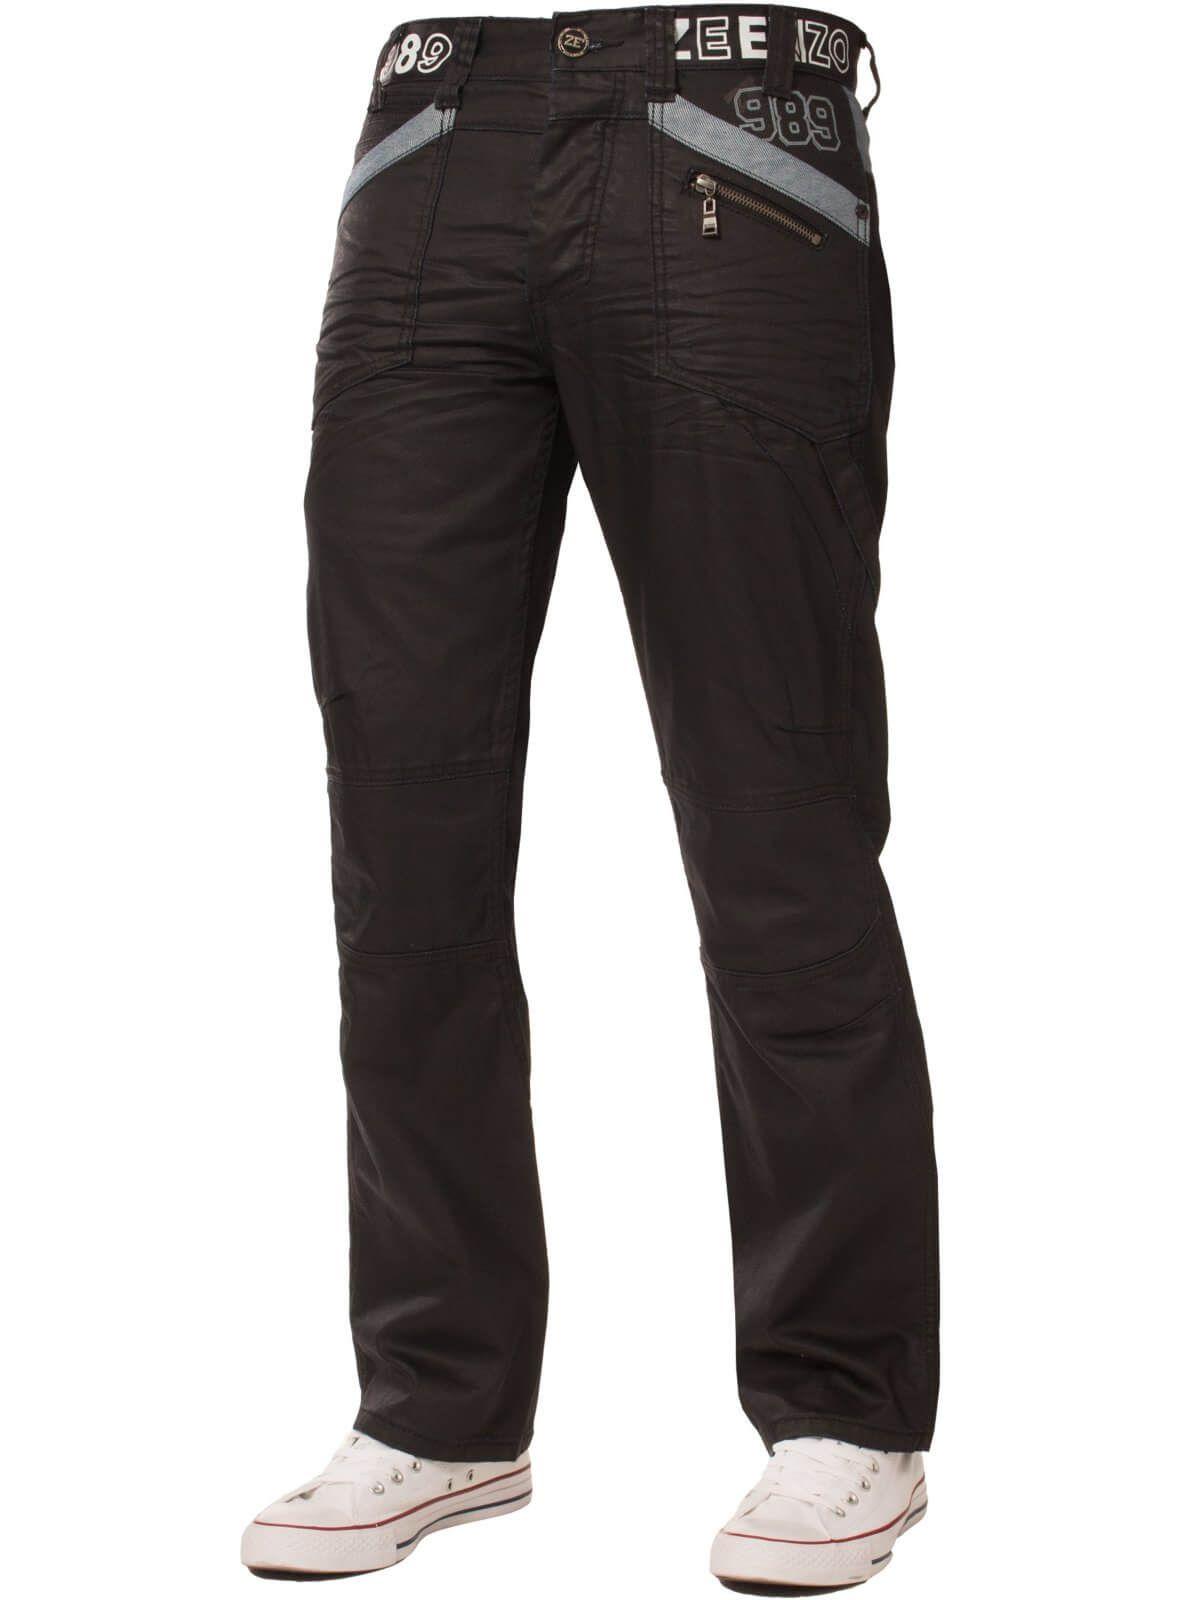 Mens   Black Coated Denim  Jeans | Enzo Designer Menswear